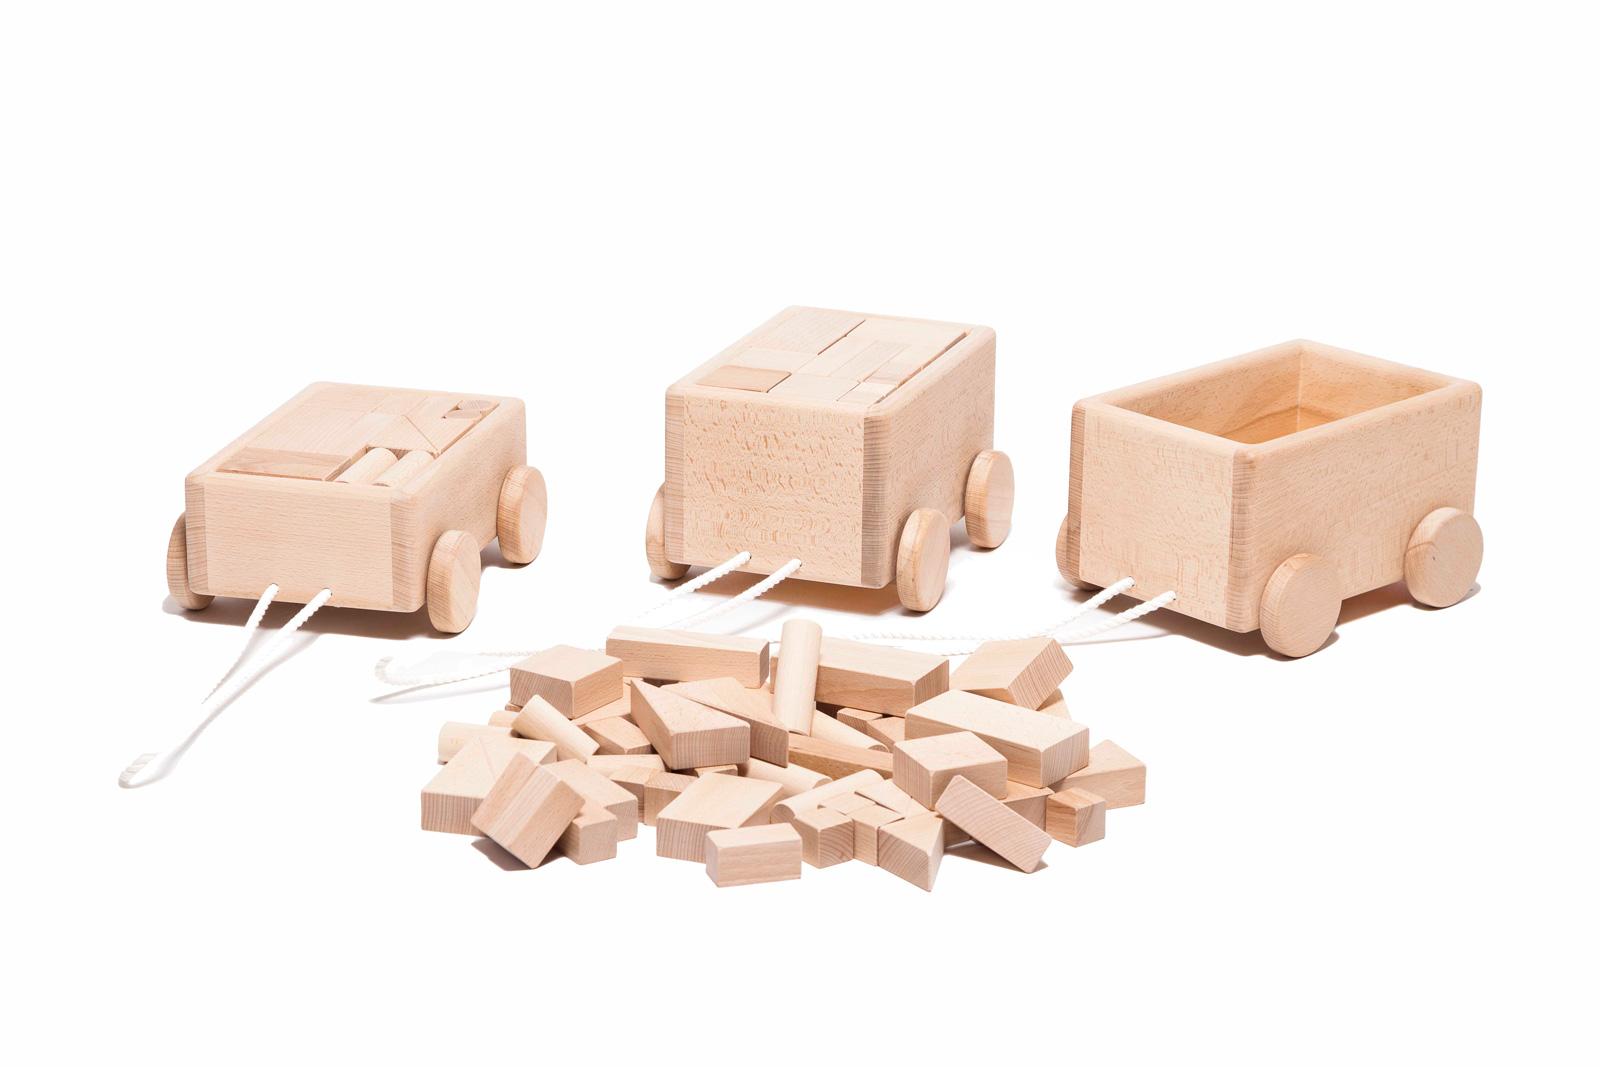 All-Natural Wooden Building Blocks (25 Piece Set)